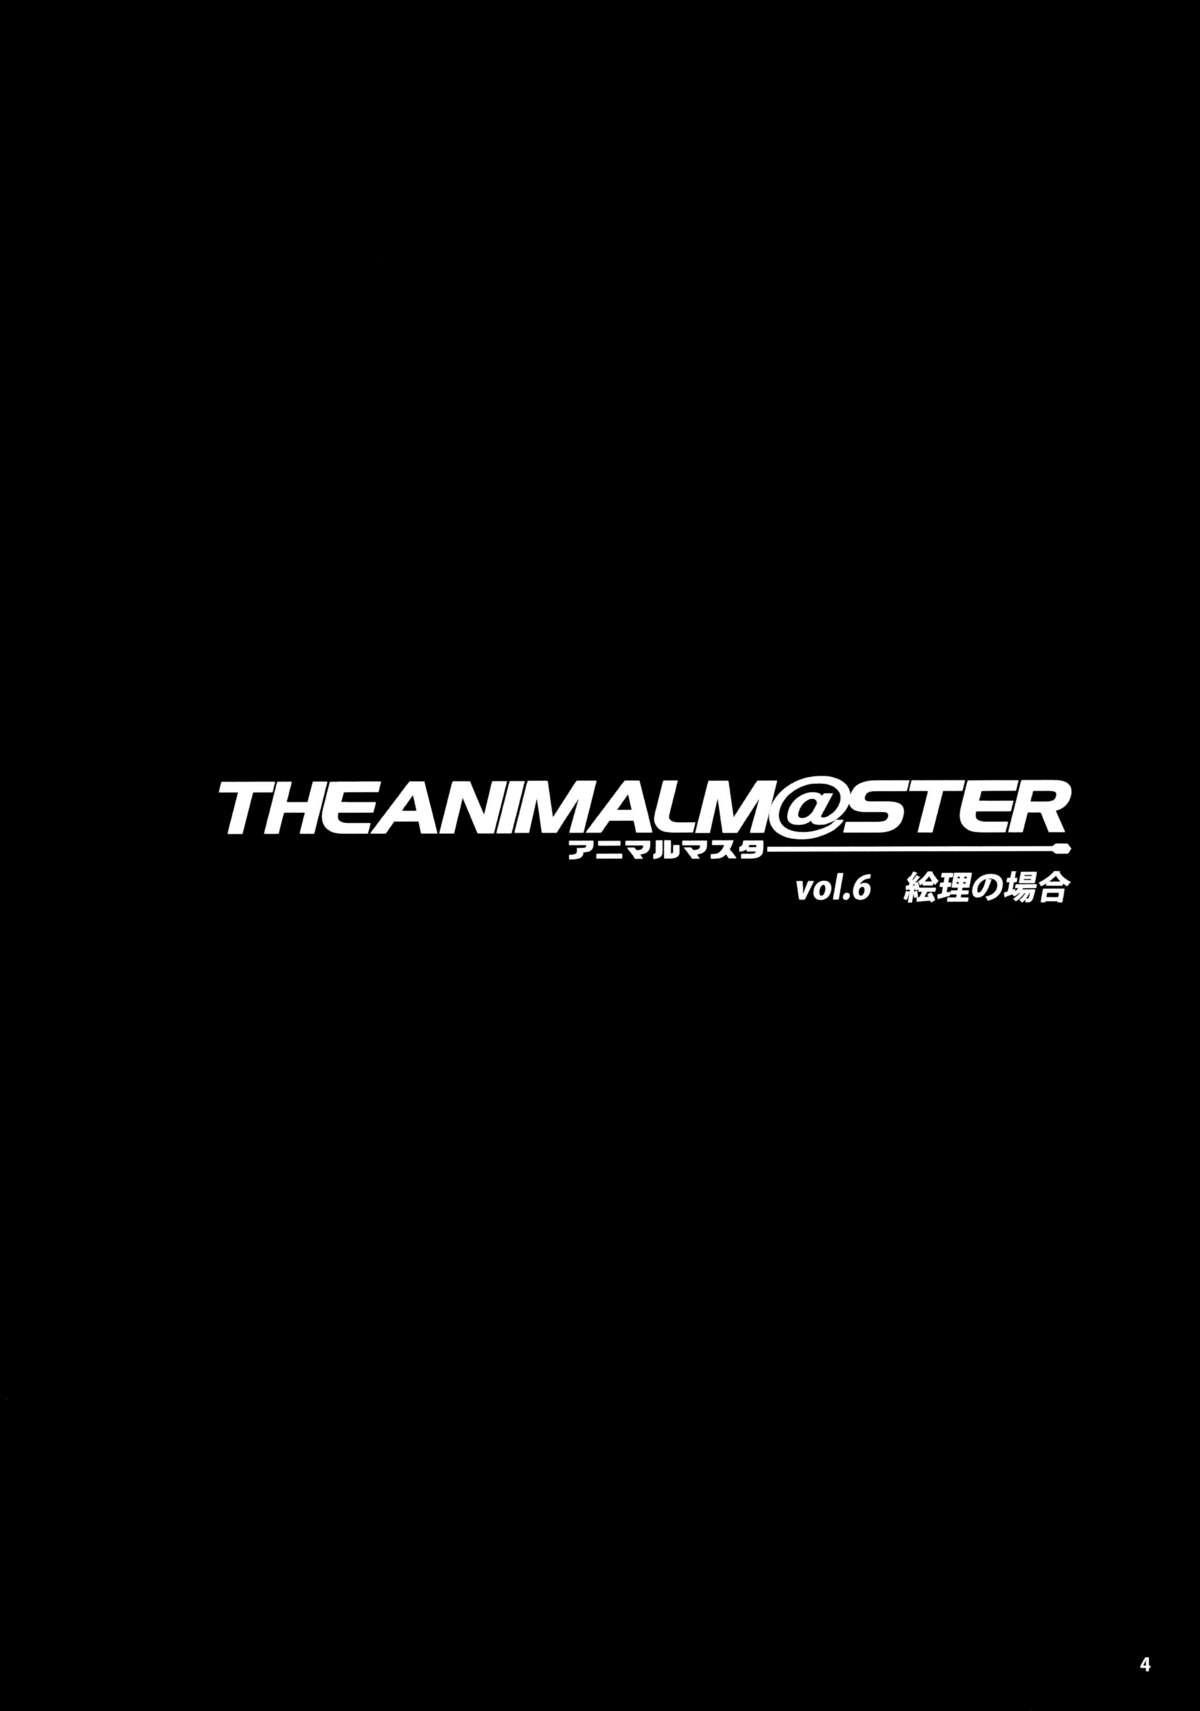 The Animalm@ster Vol.6 4